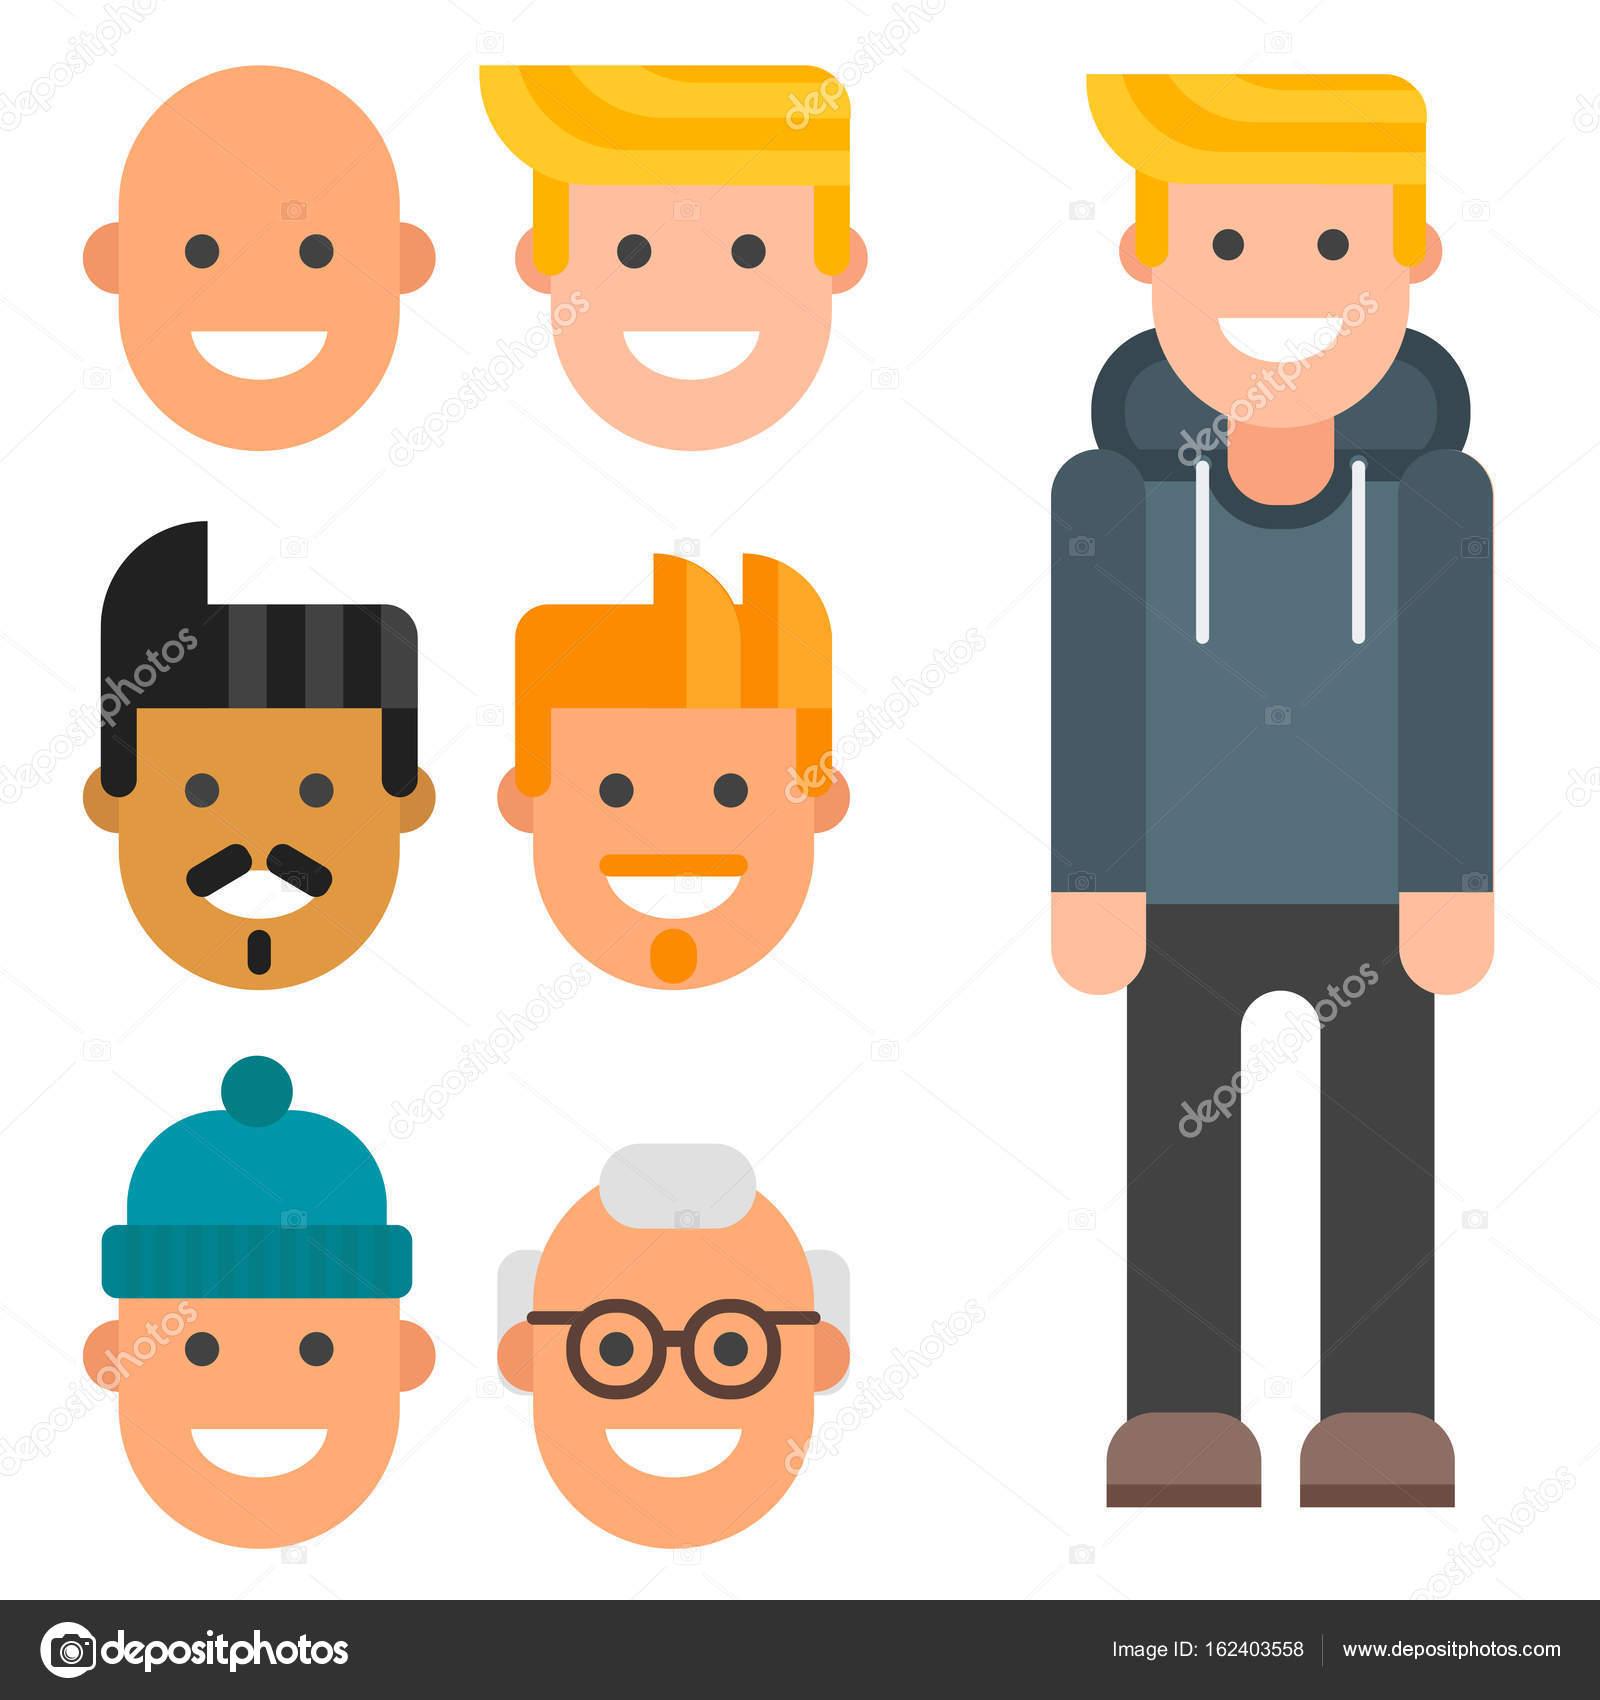 man constructor body avatar creator vector cartoon character rh depositphotos com online vector creator vector creator online free